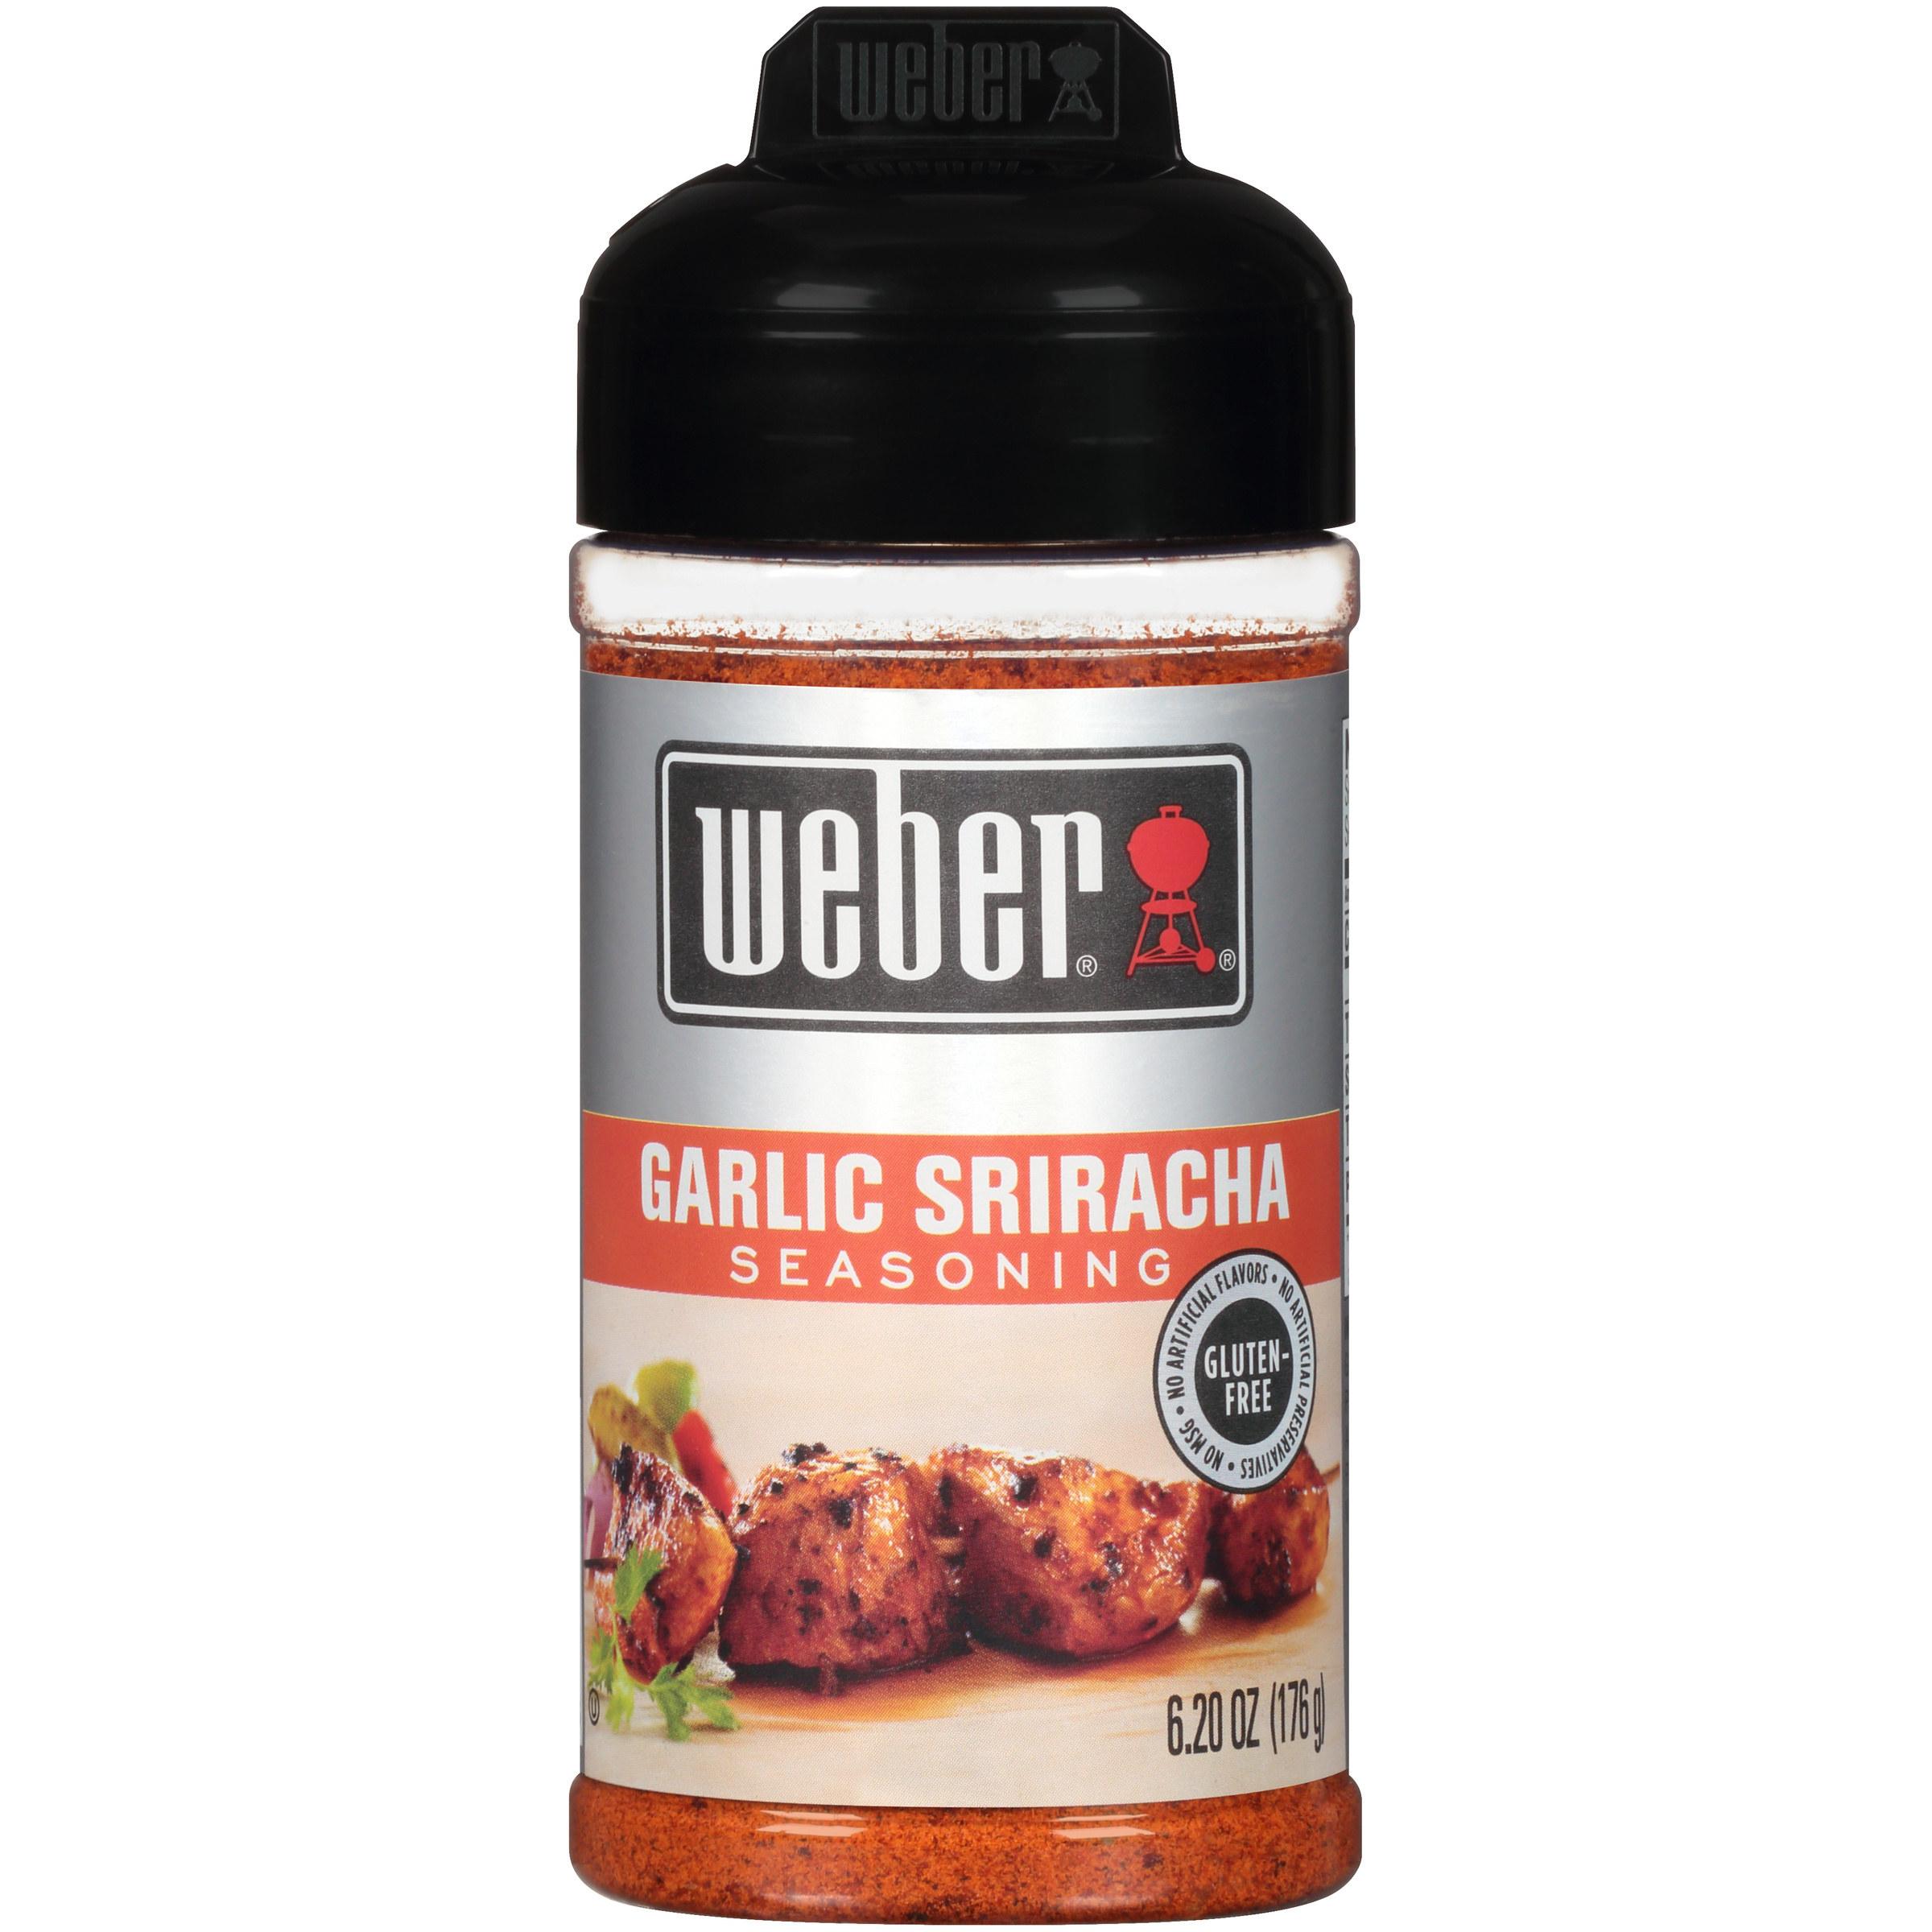 the shaker of seasoning